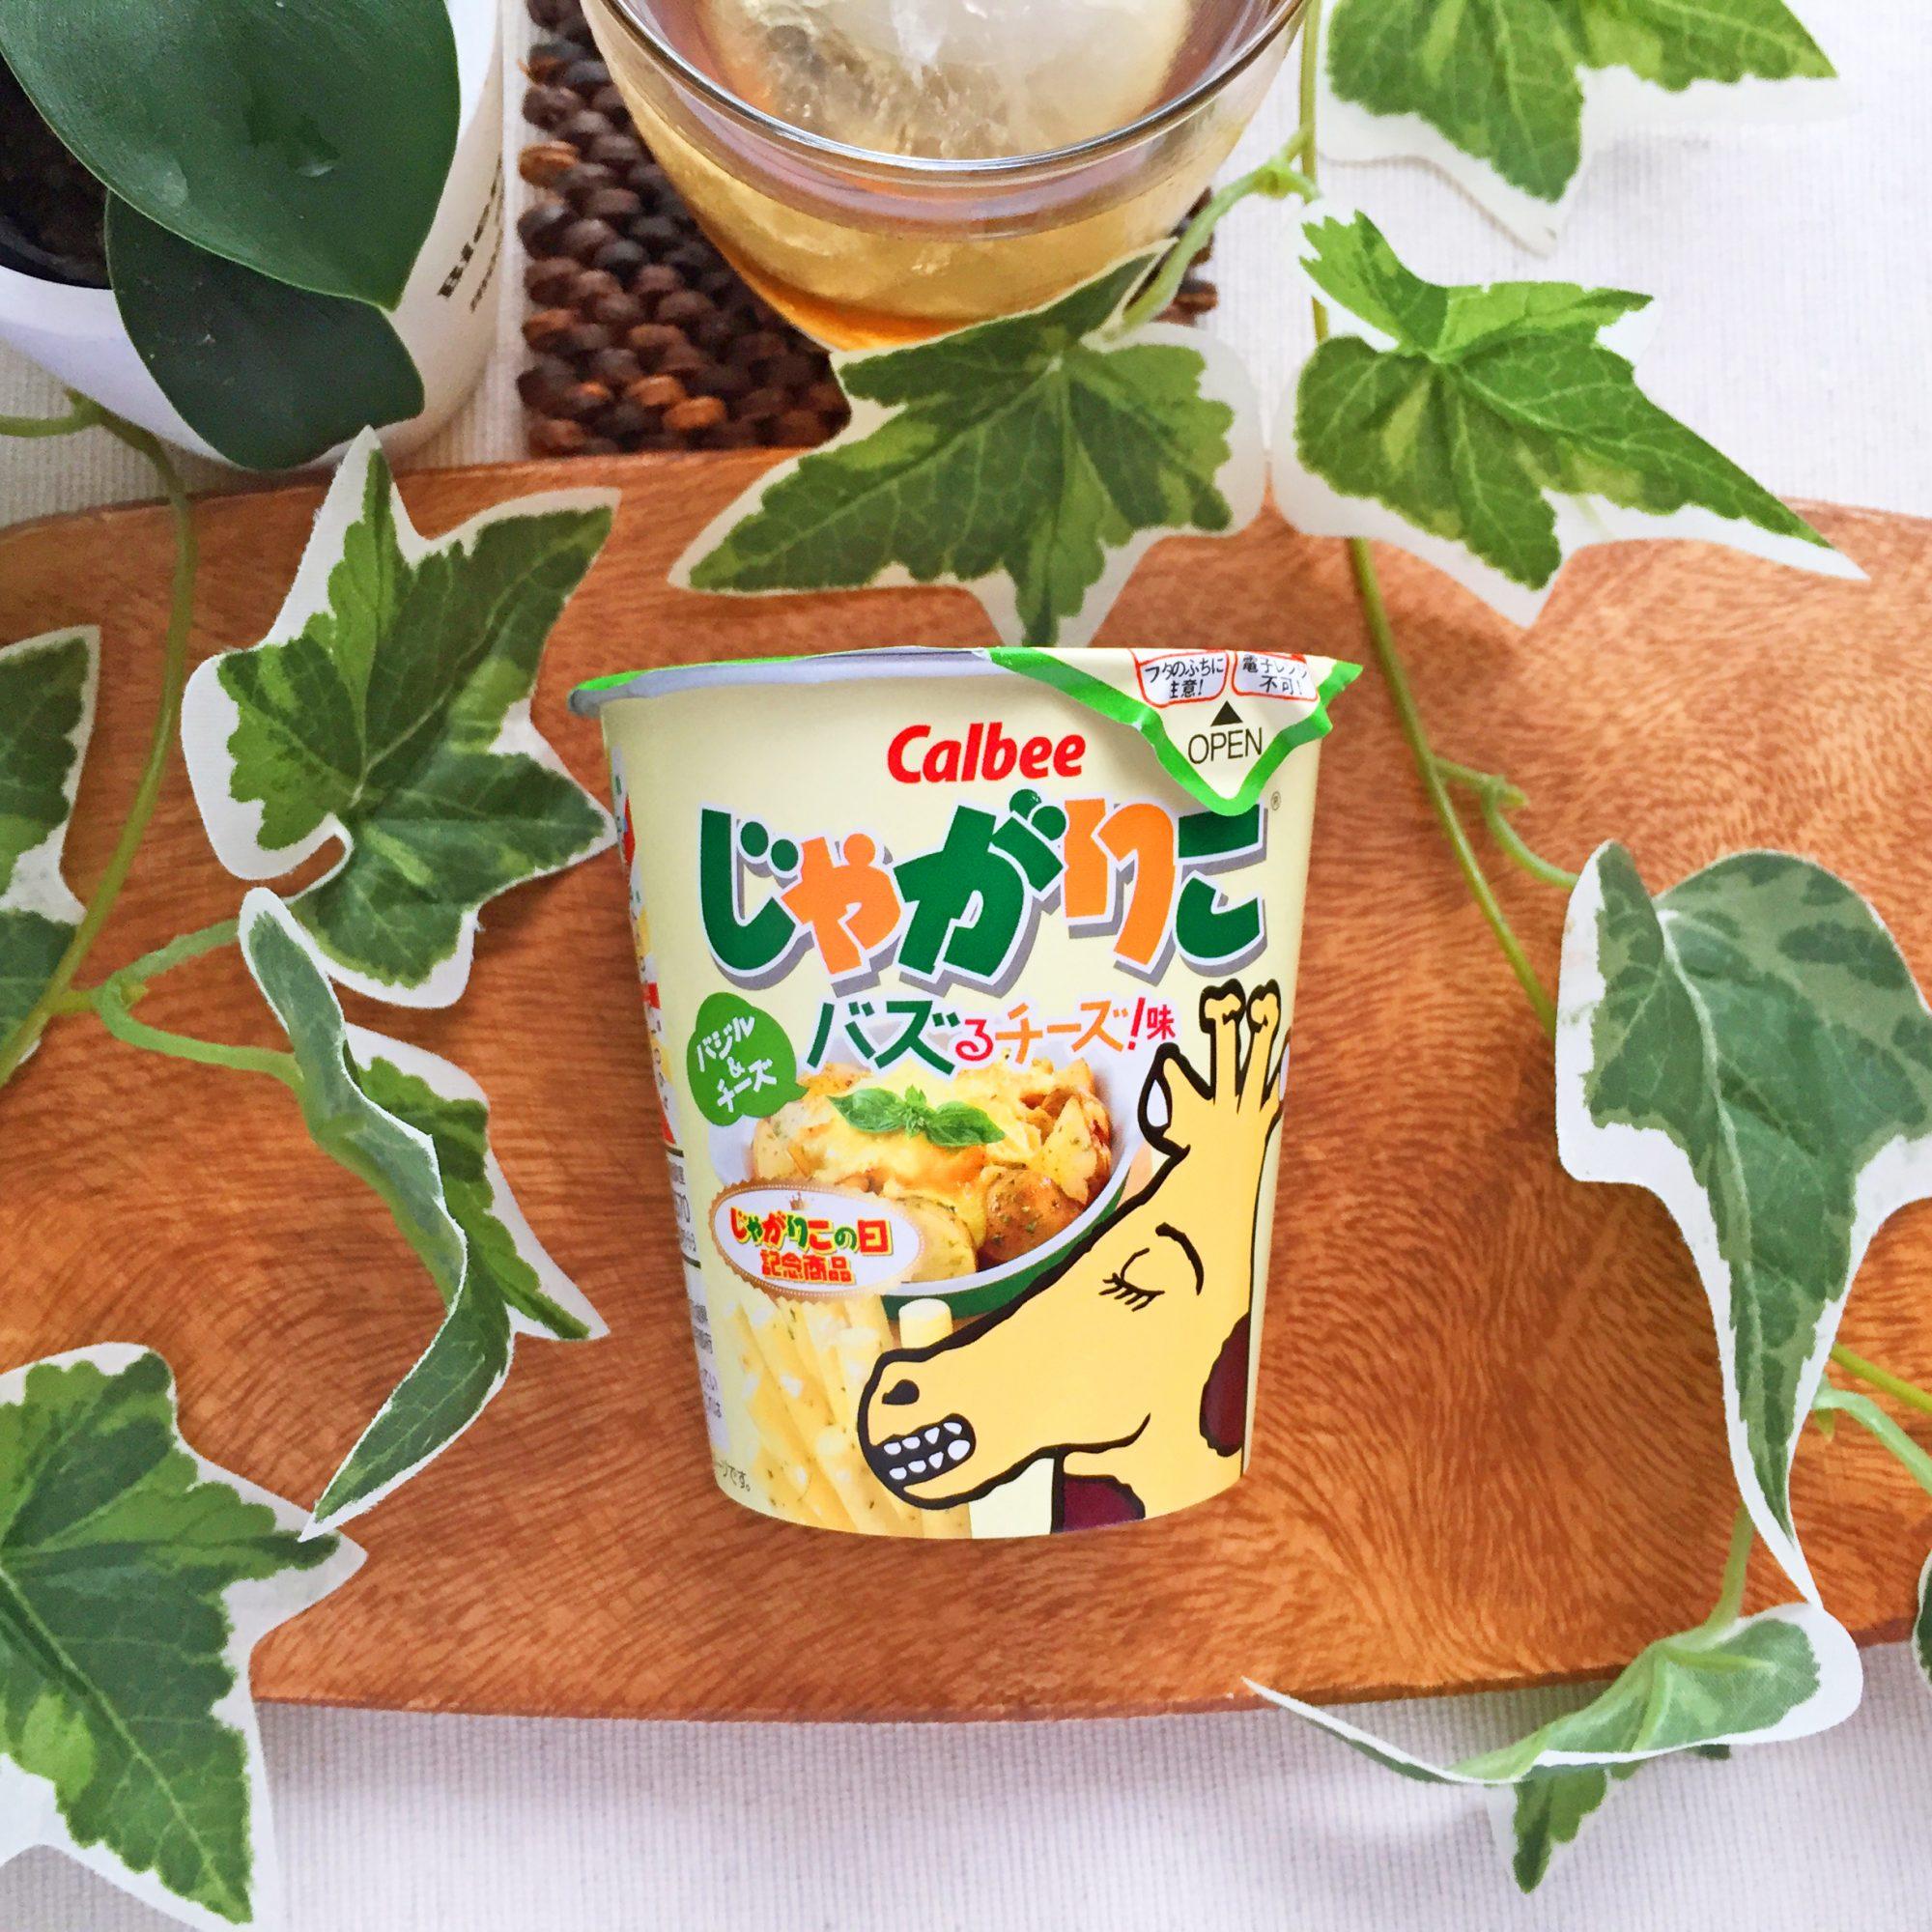 Calbee『じゃがりこ バズるチーズ!味』はバジルの風味豊かな期間限定の料理系じゃがりこ!チーズのコクがお酒との相性も良さそう◎